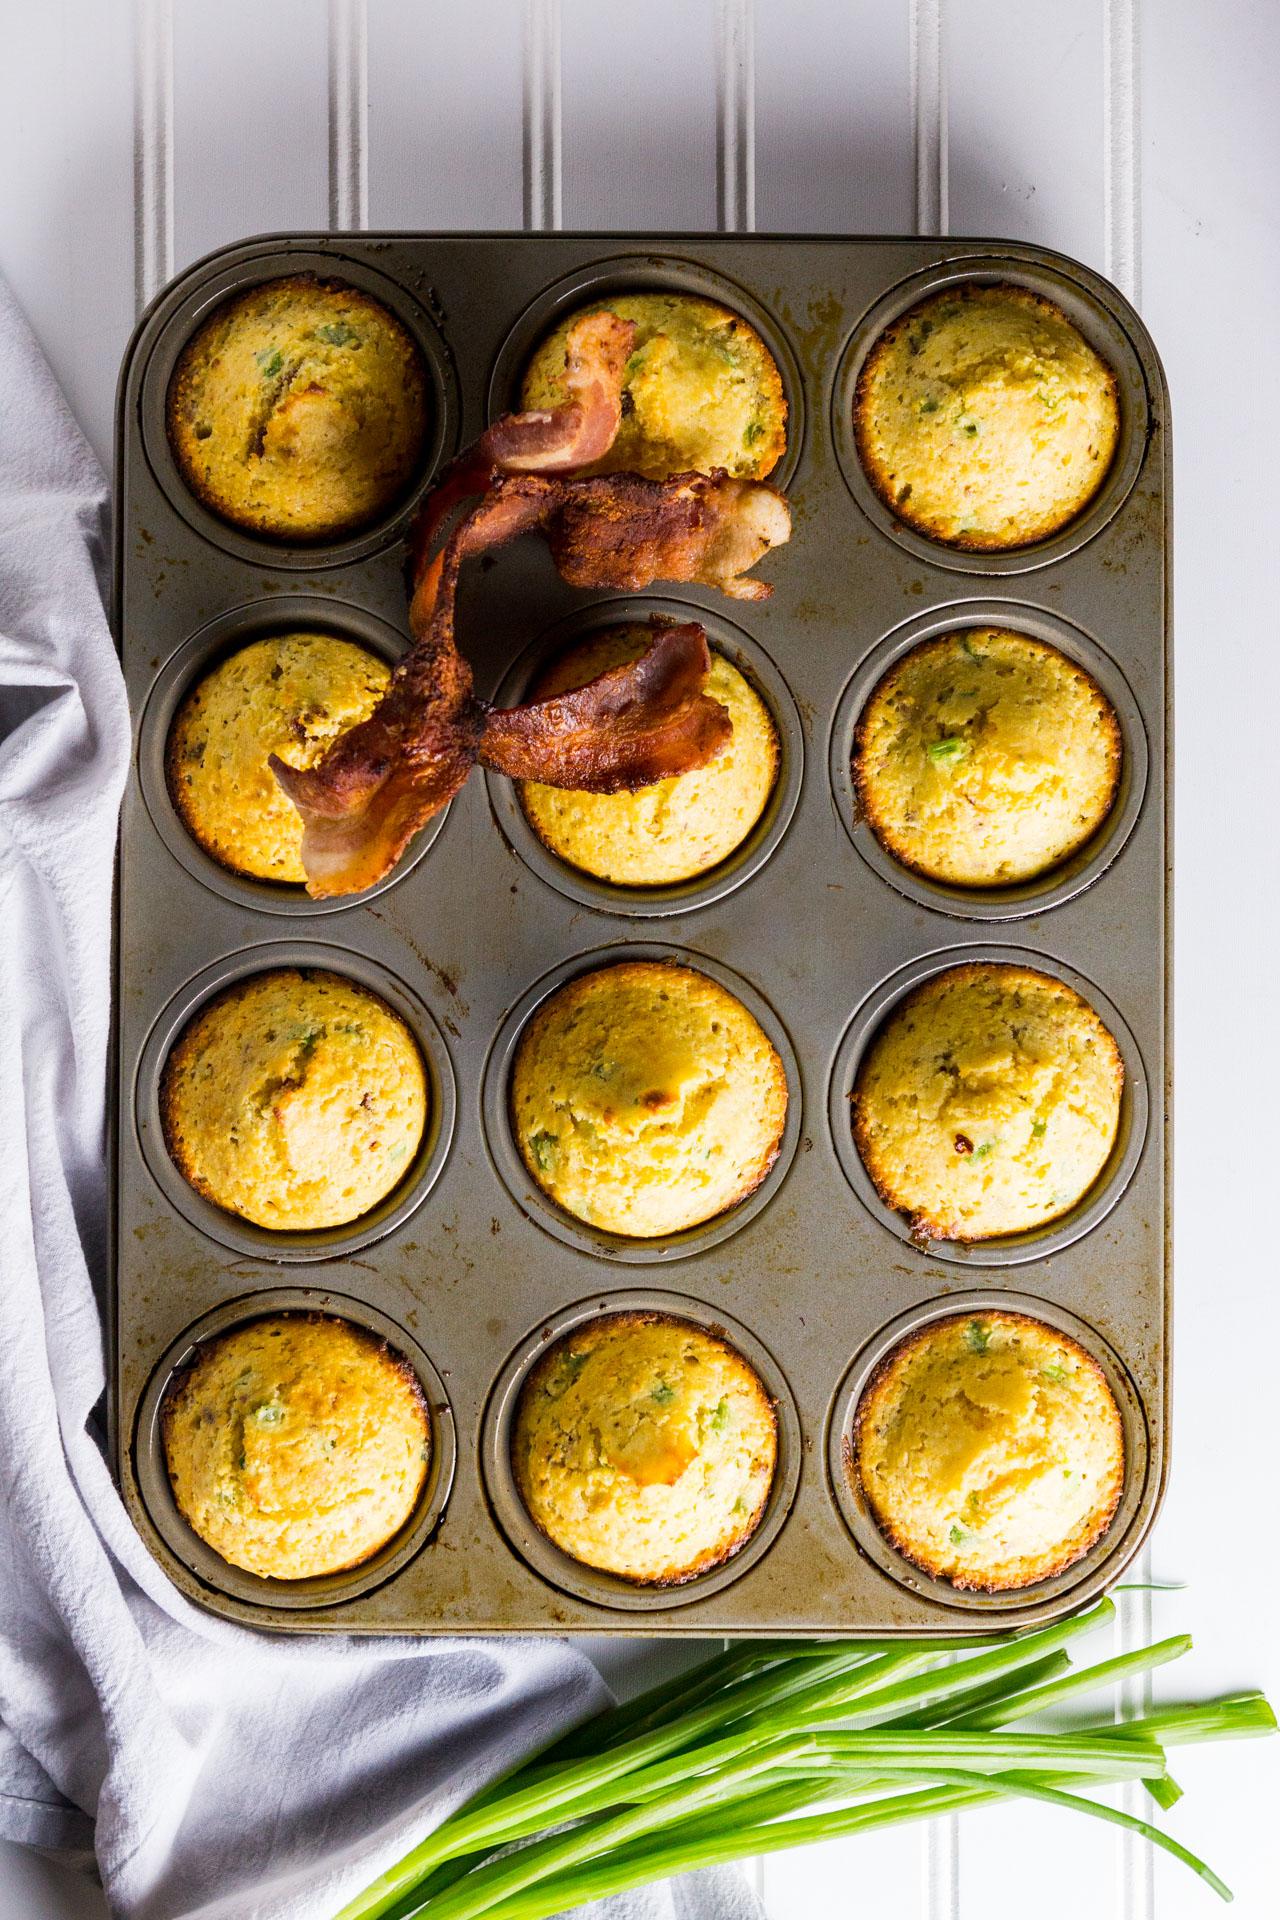 cornbread-bacon-scallions-3.jpg